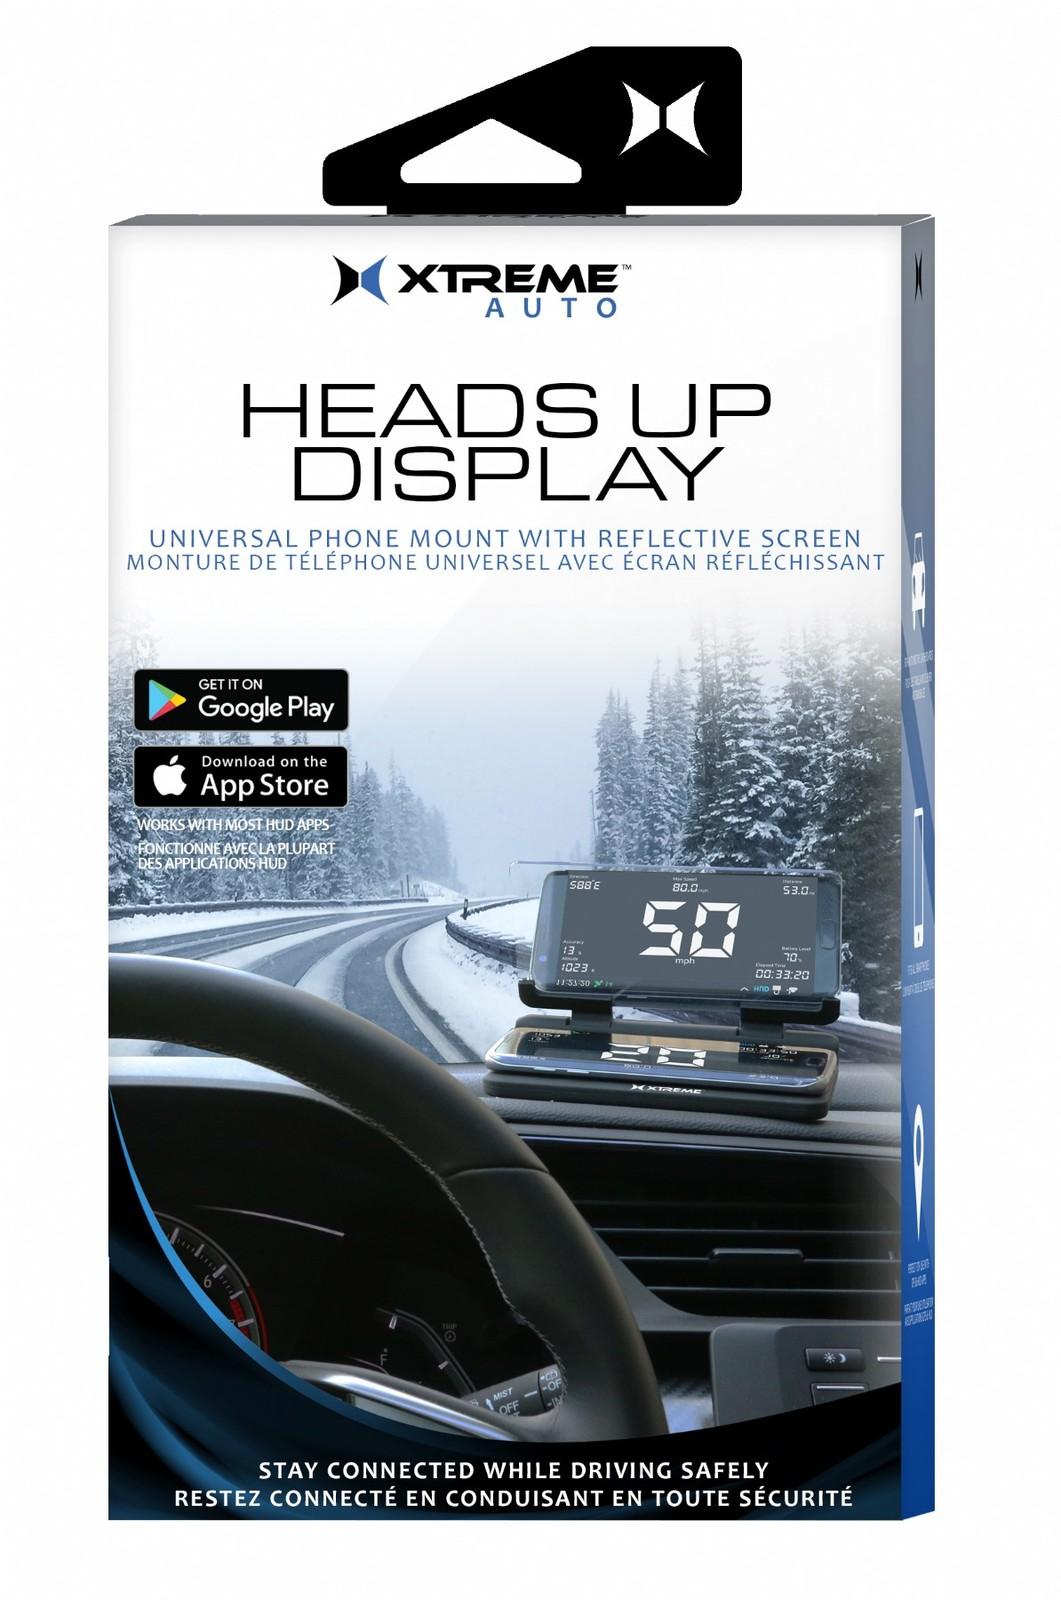 Xtreme: Heads Up Display image